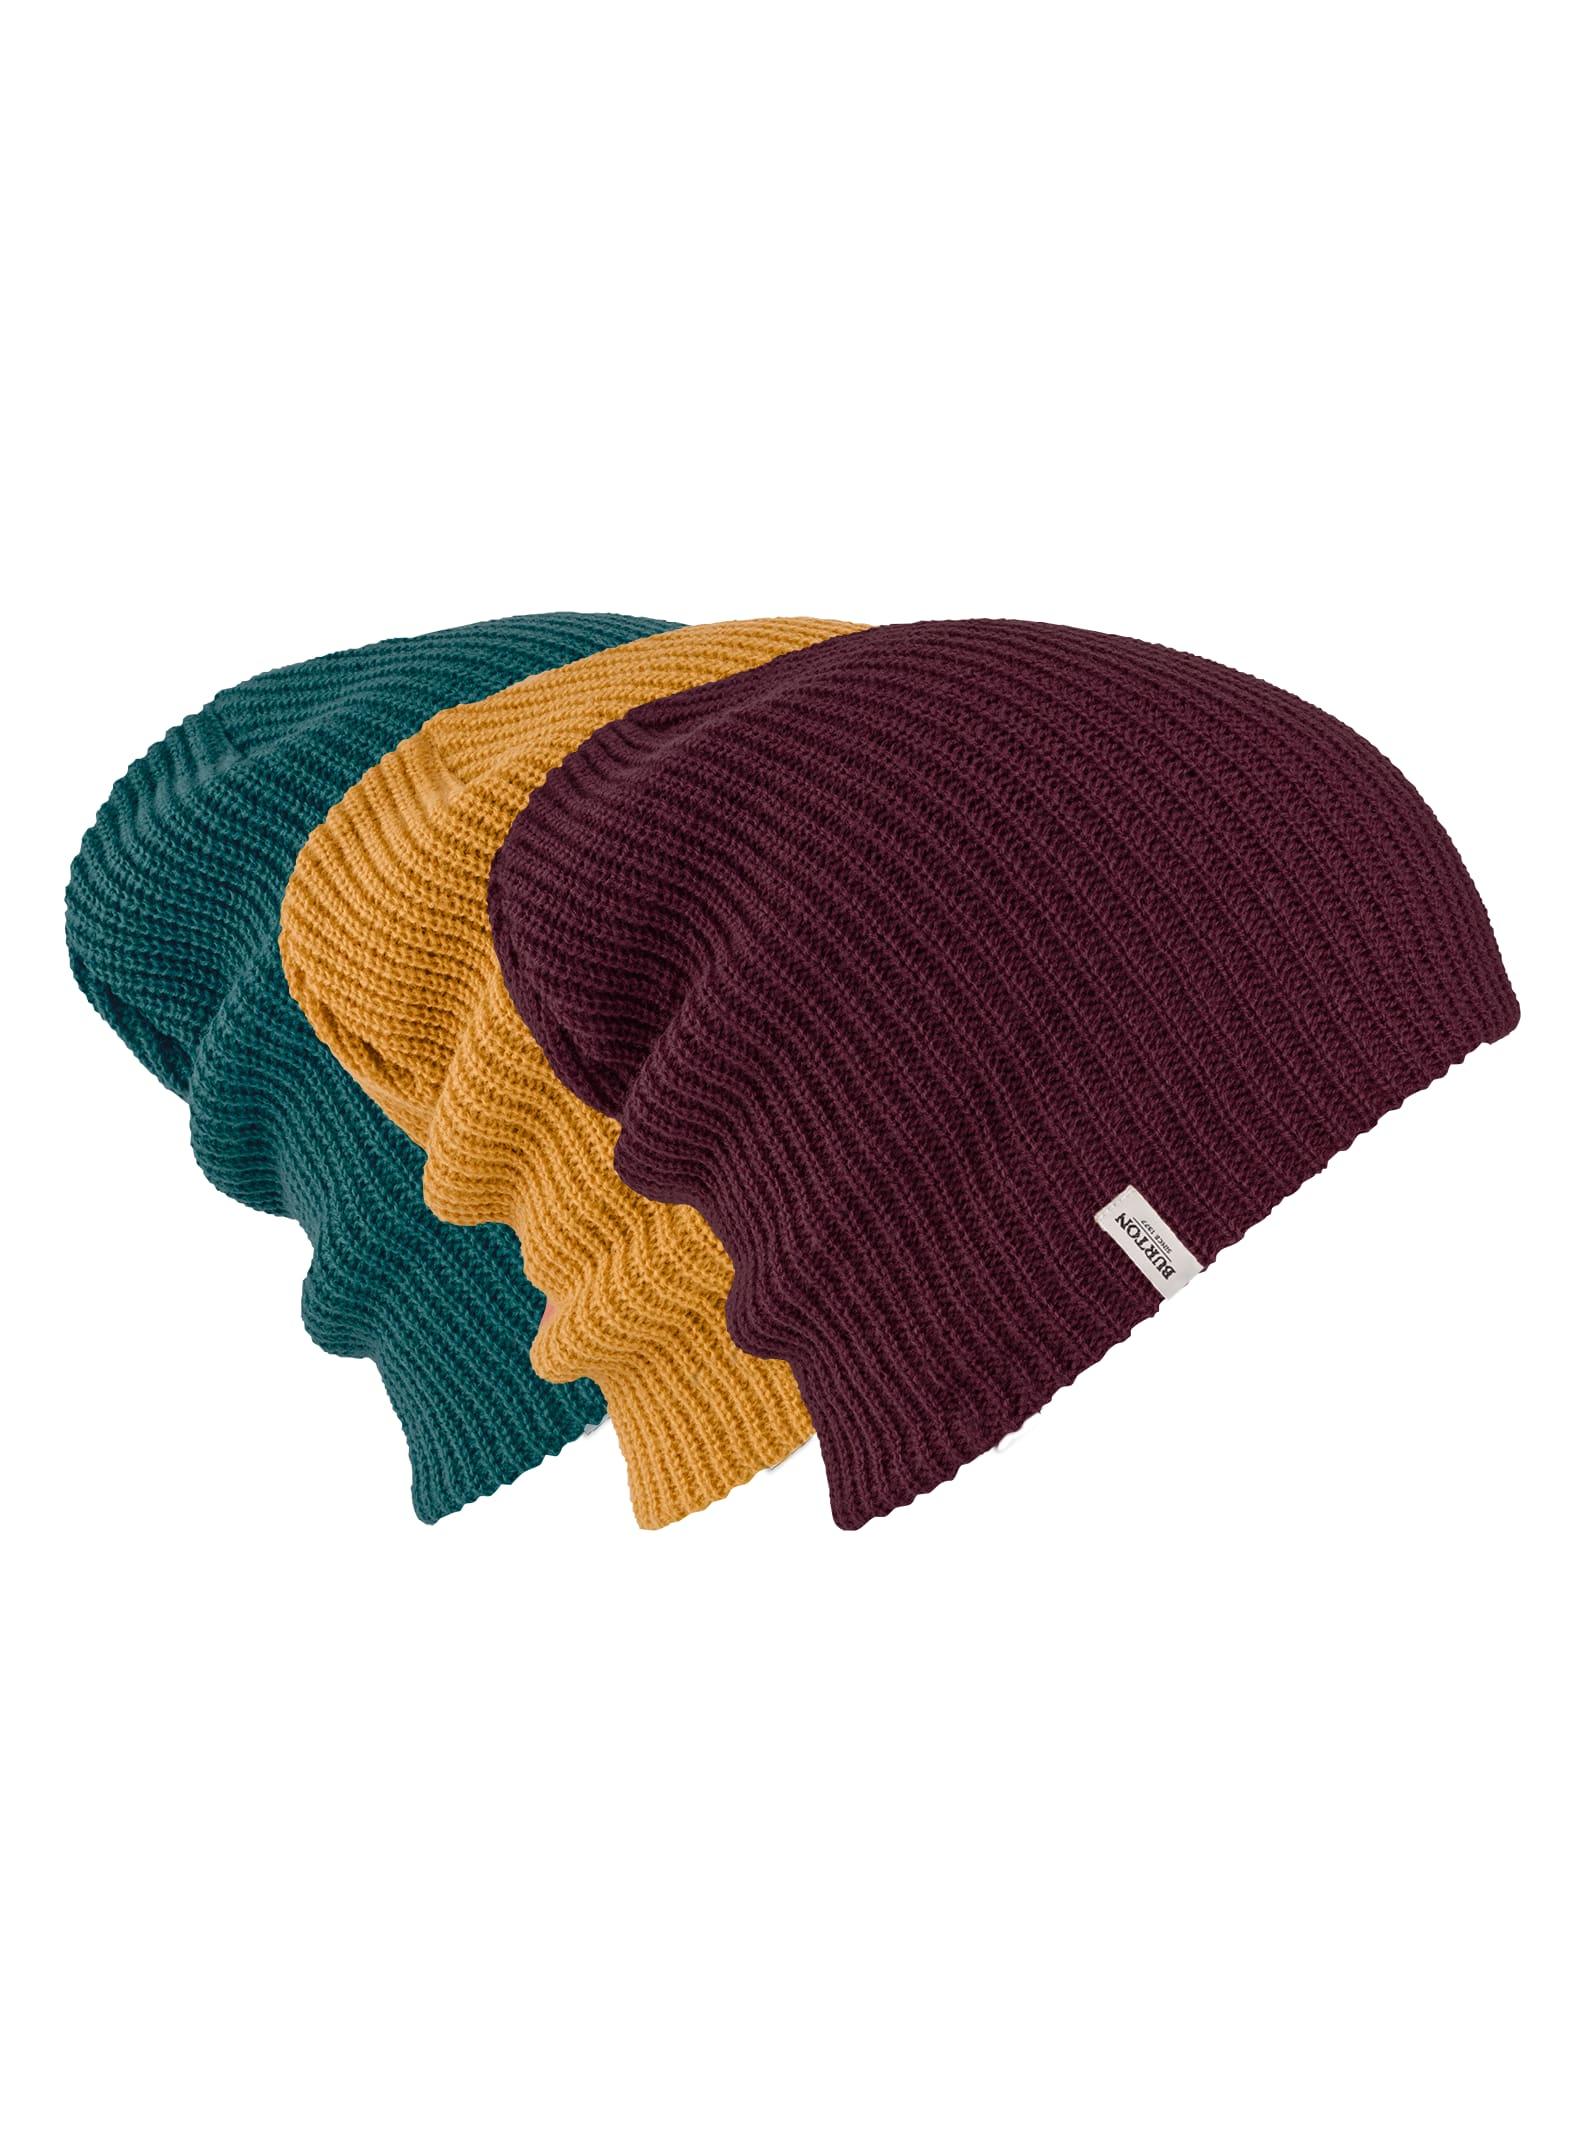 00d323336 Men's Beanies & Headbands | Burton Snowboards